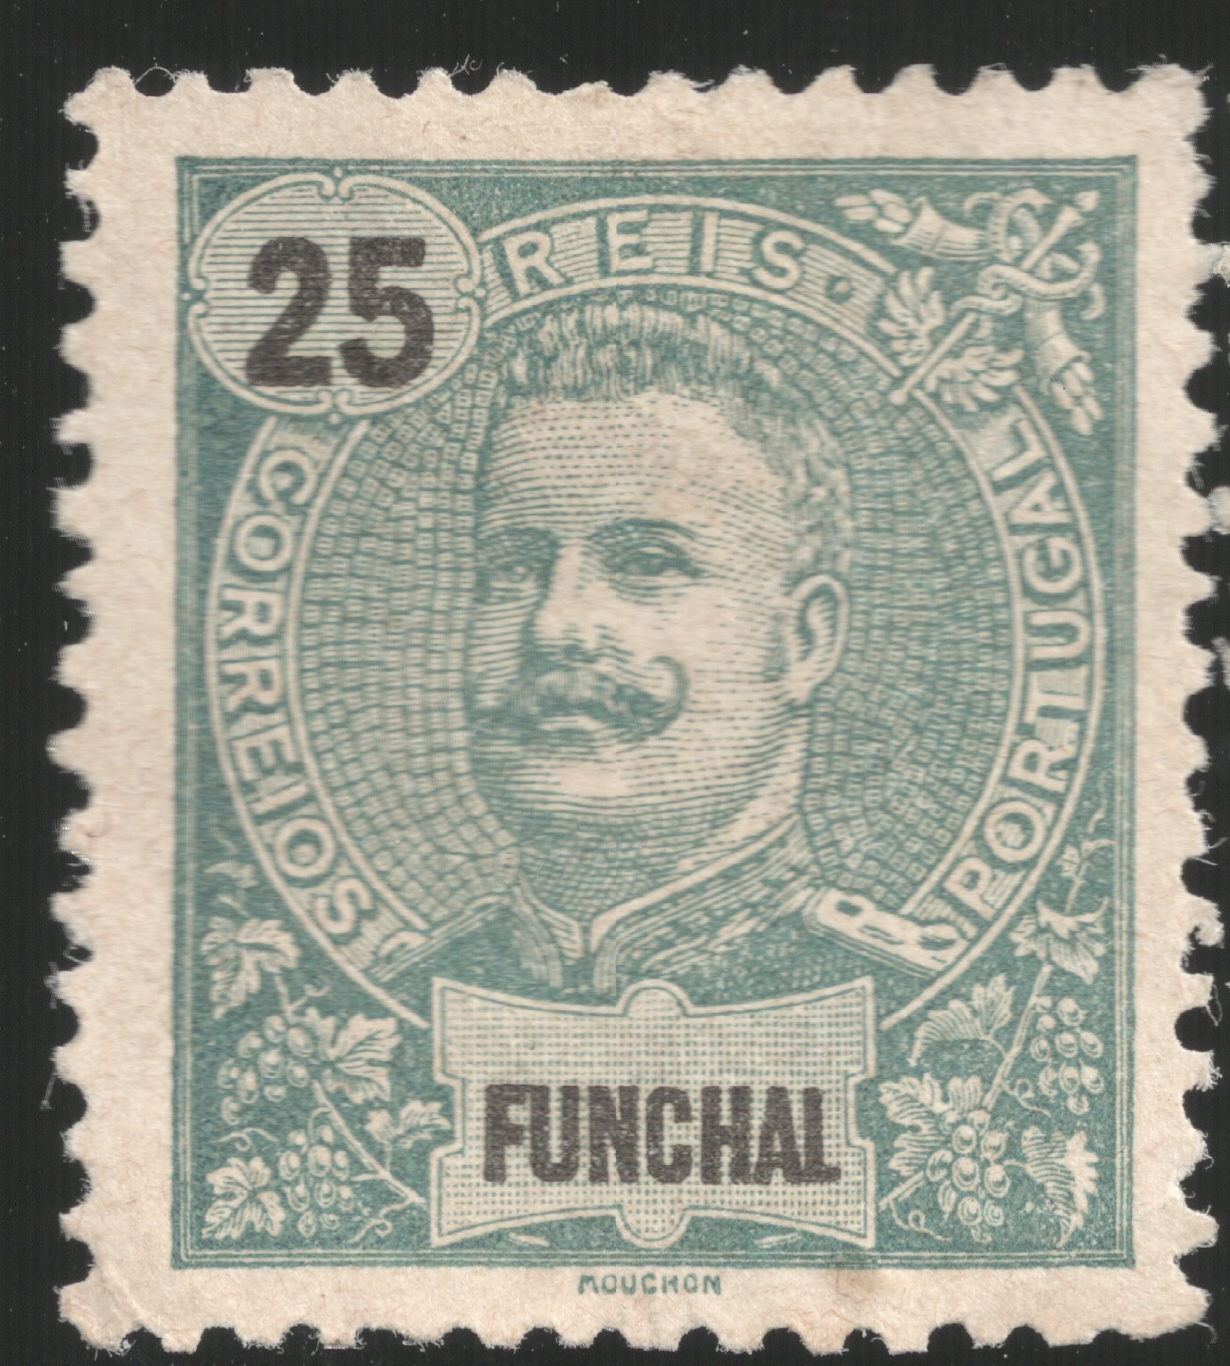 http://3.bp.blogspot.com/-fr8xeA5HWE0/Tx3BHAzcWGI/AAAAAAAAB-0/m4-favd1Lv4/s1600/Scan_Funchal19.jpg